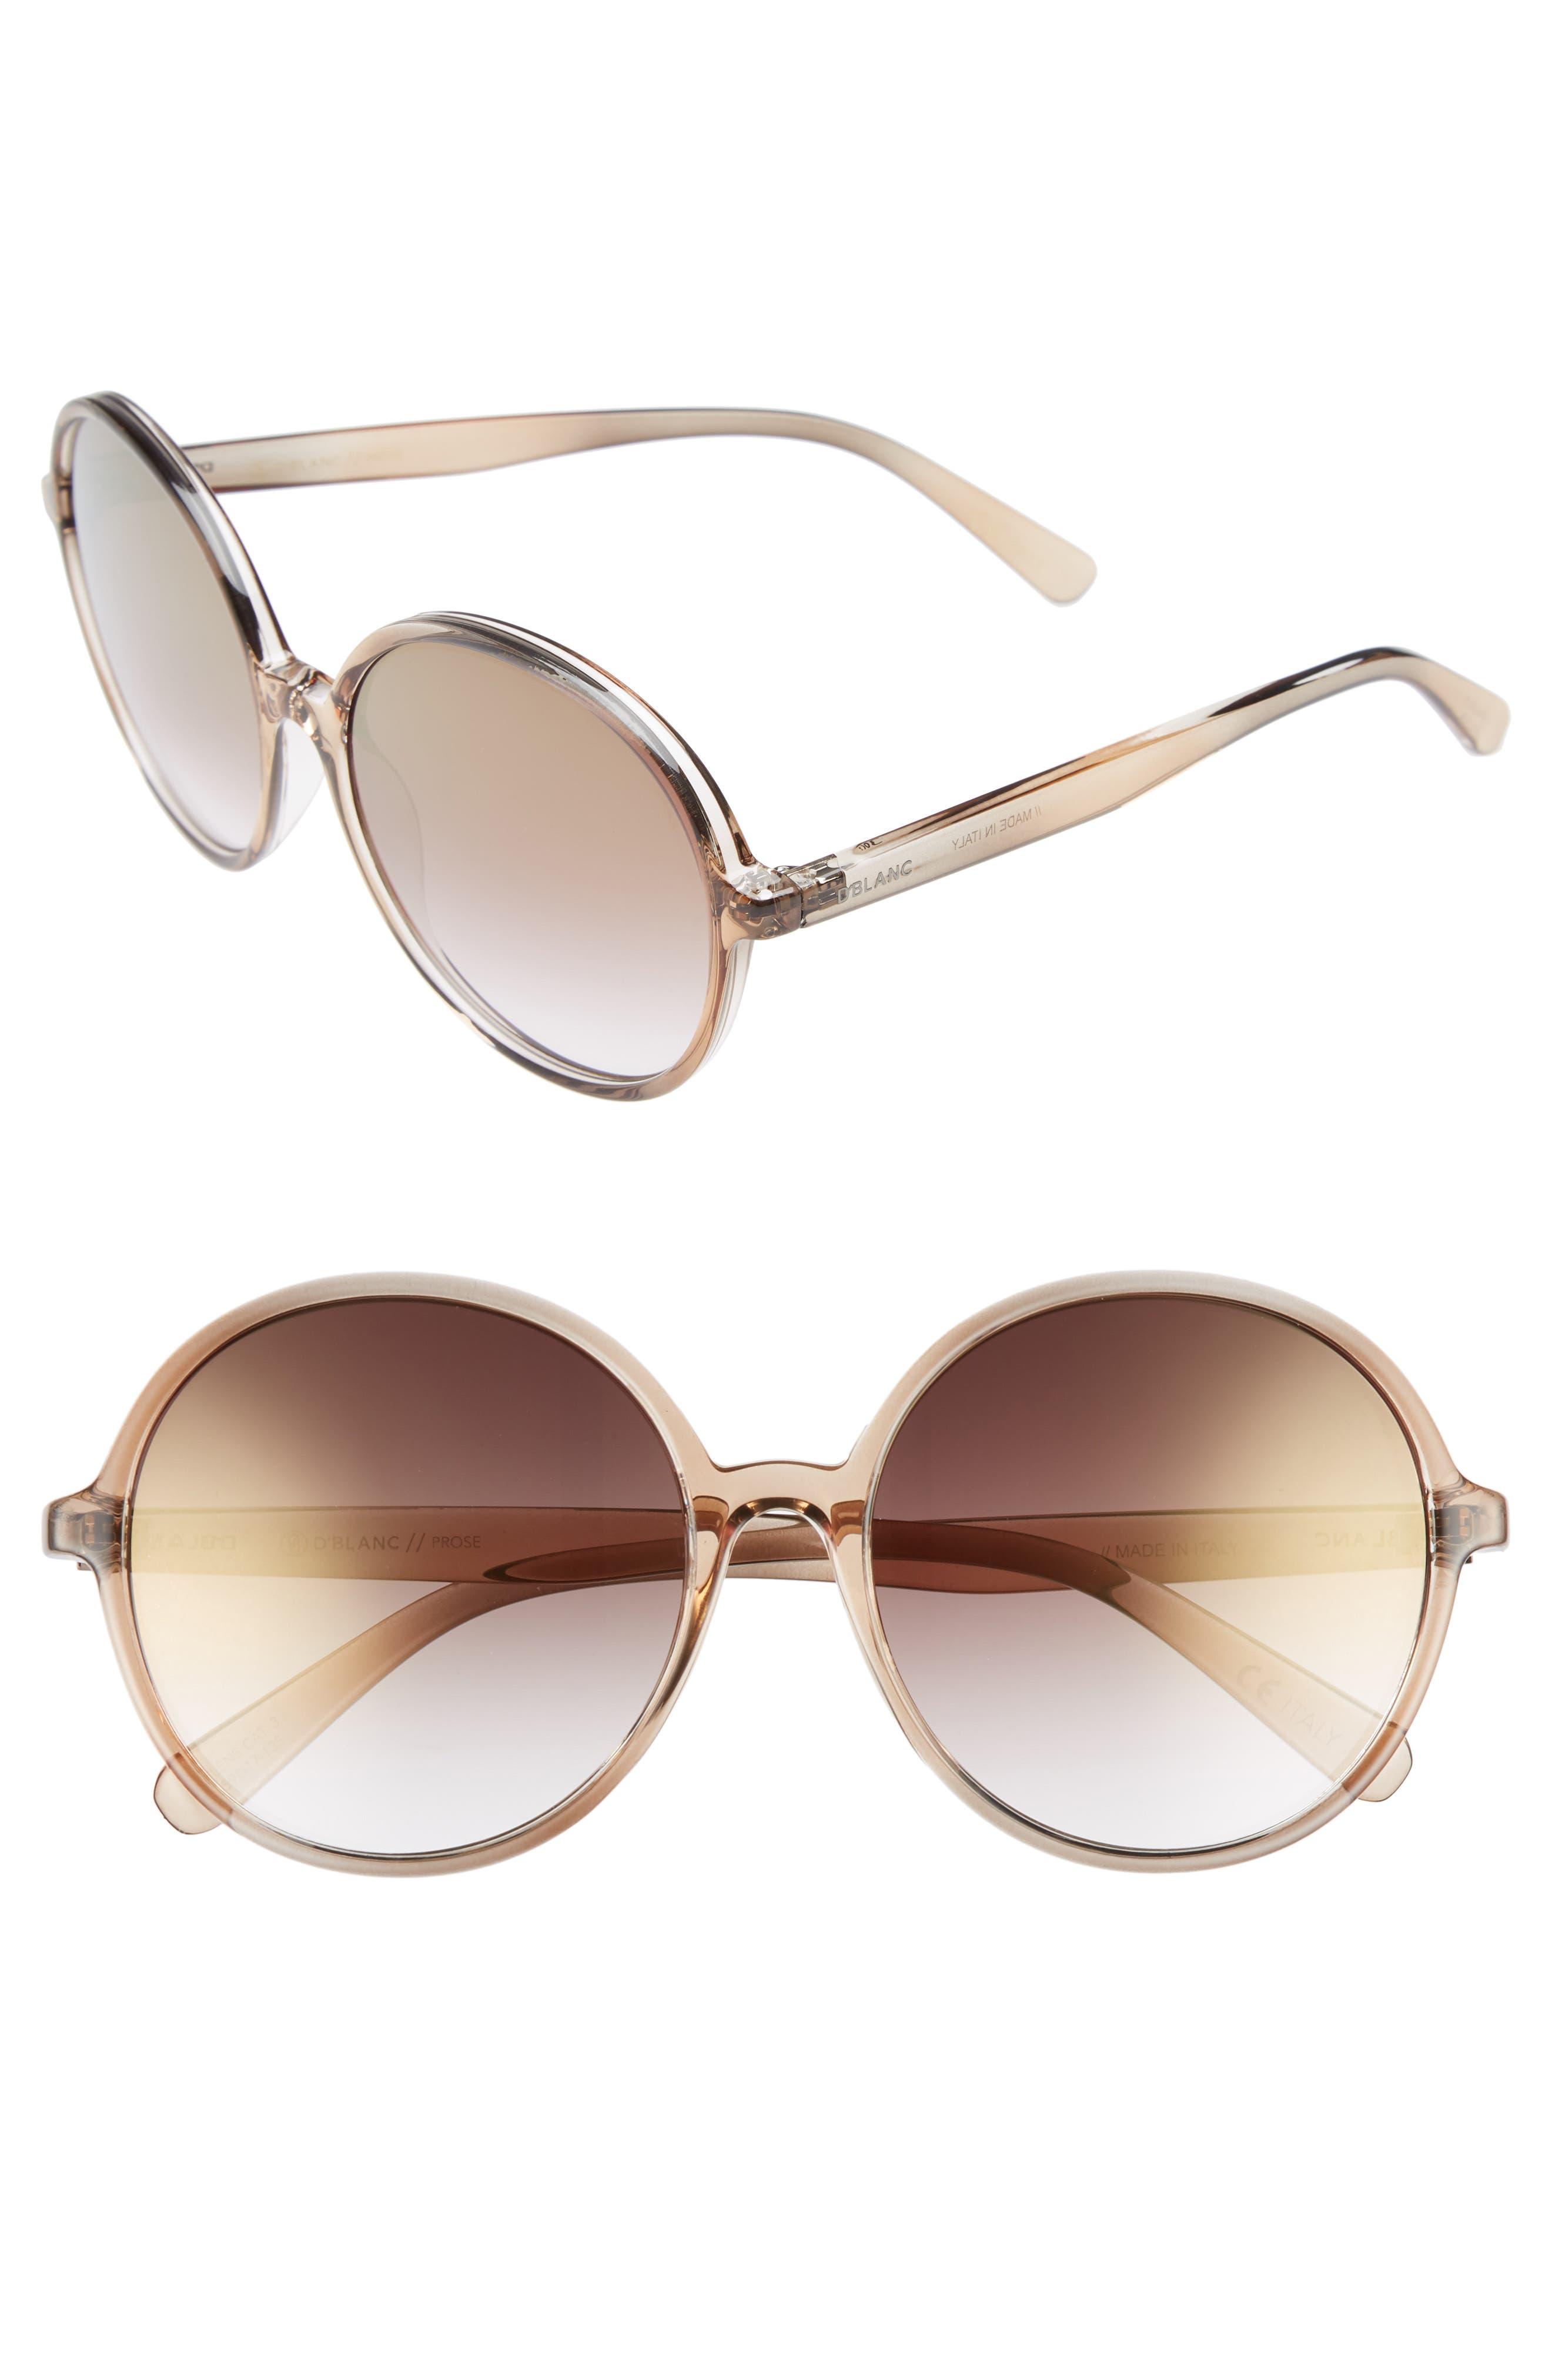 D'BLANC Prose 59mm Round Sunglasses,                             Main thumbnail 1, color,                             BROWN OMBRE